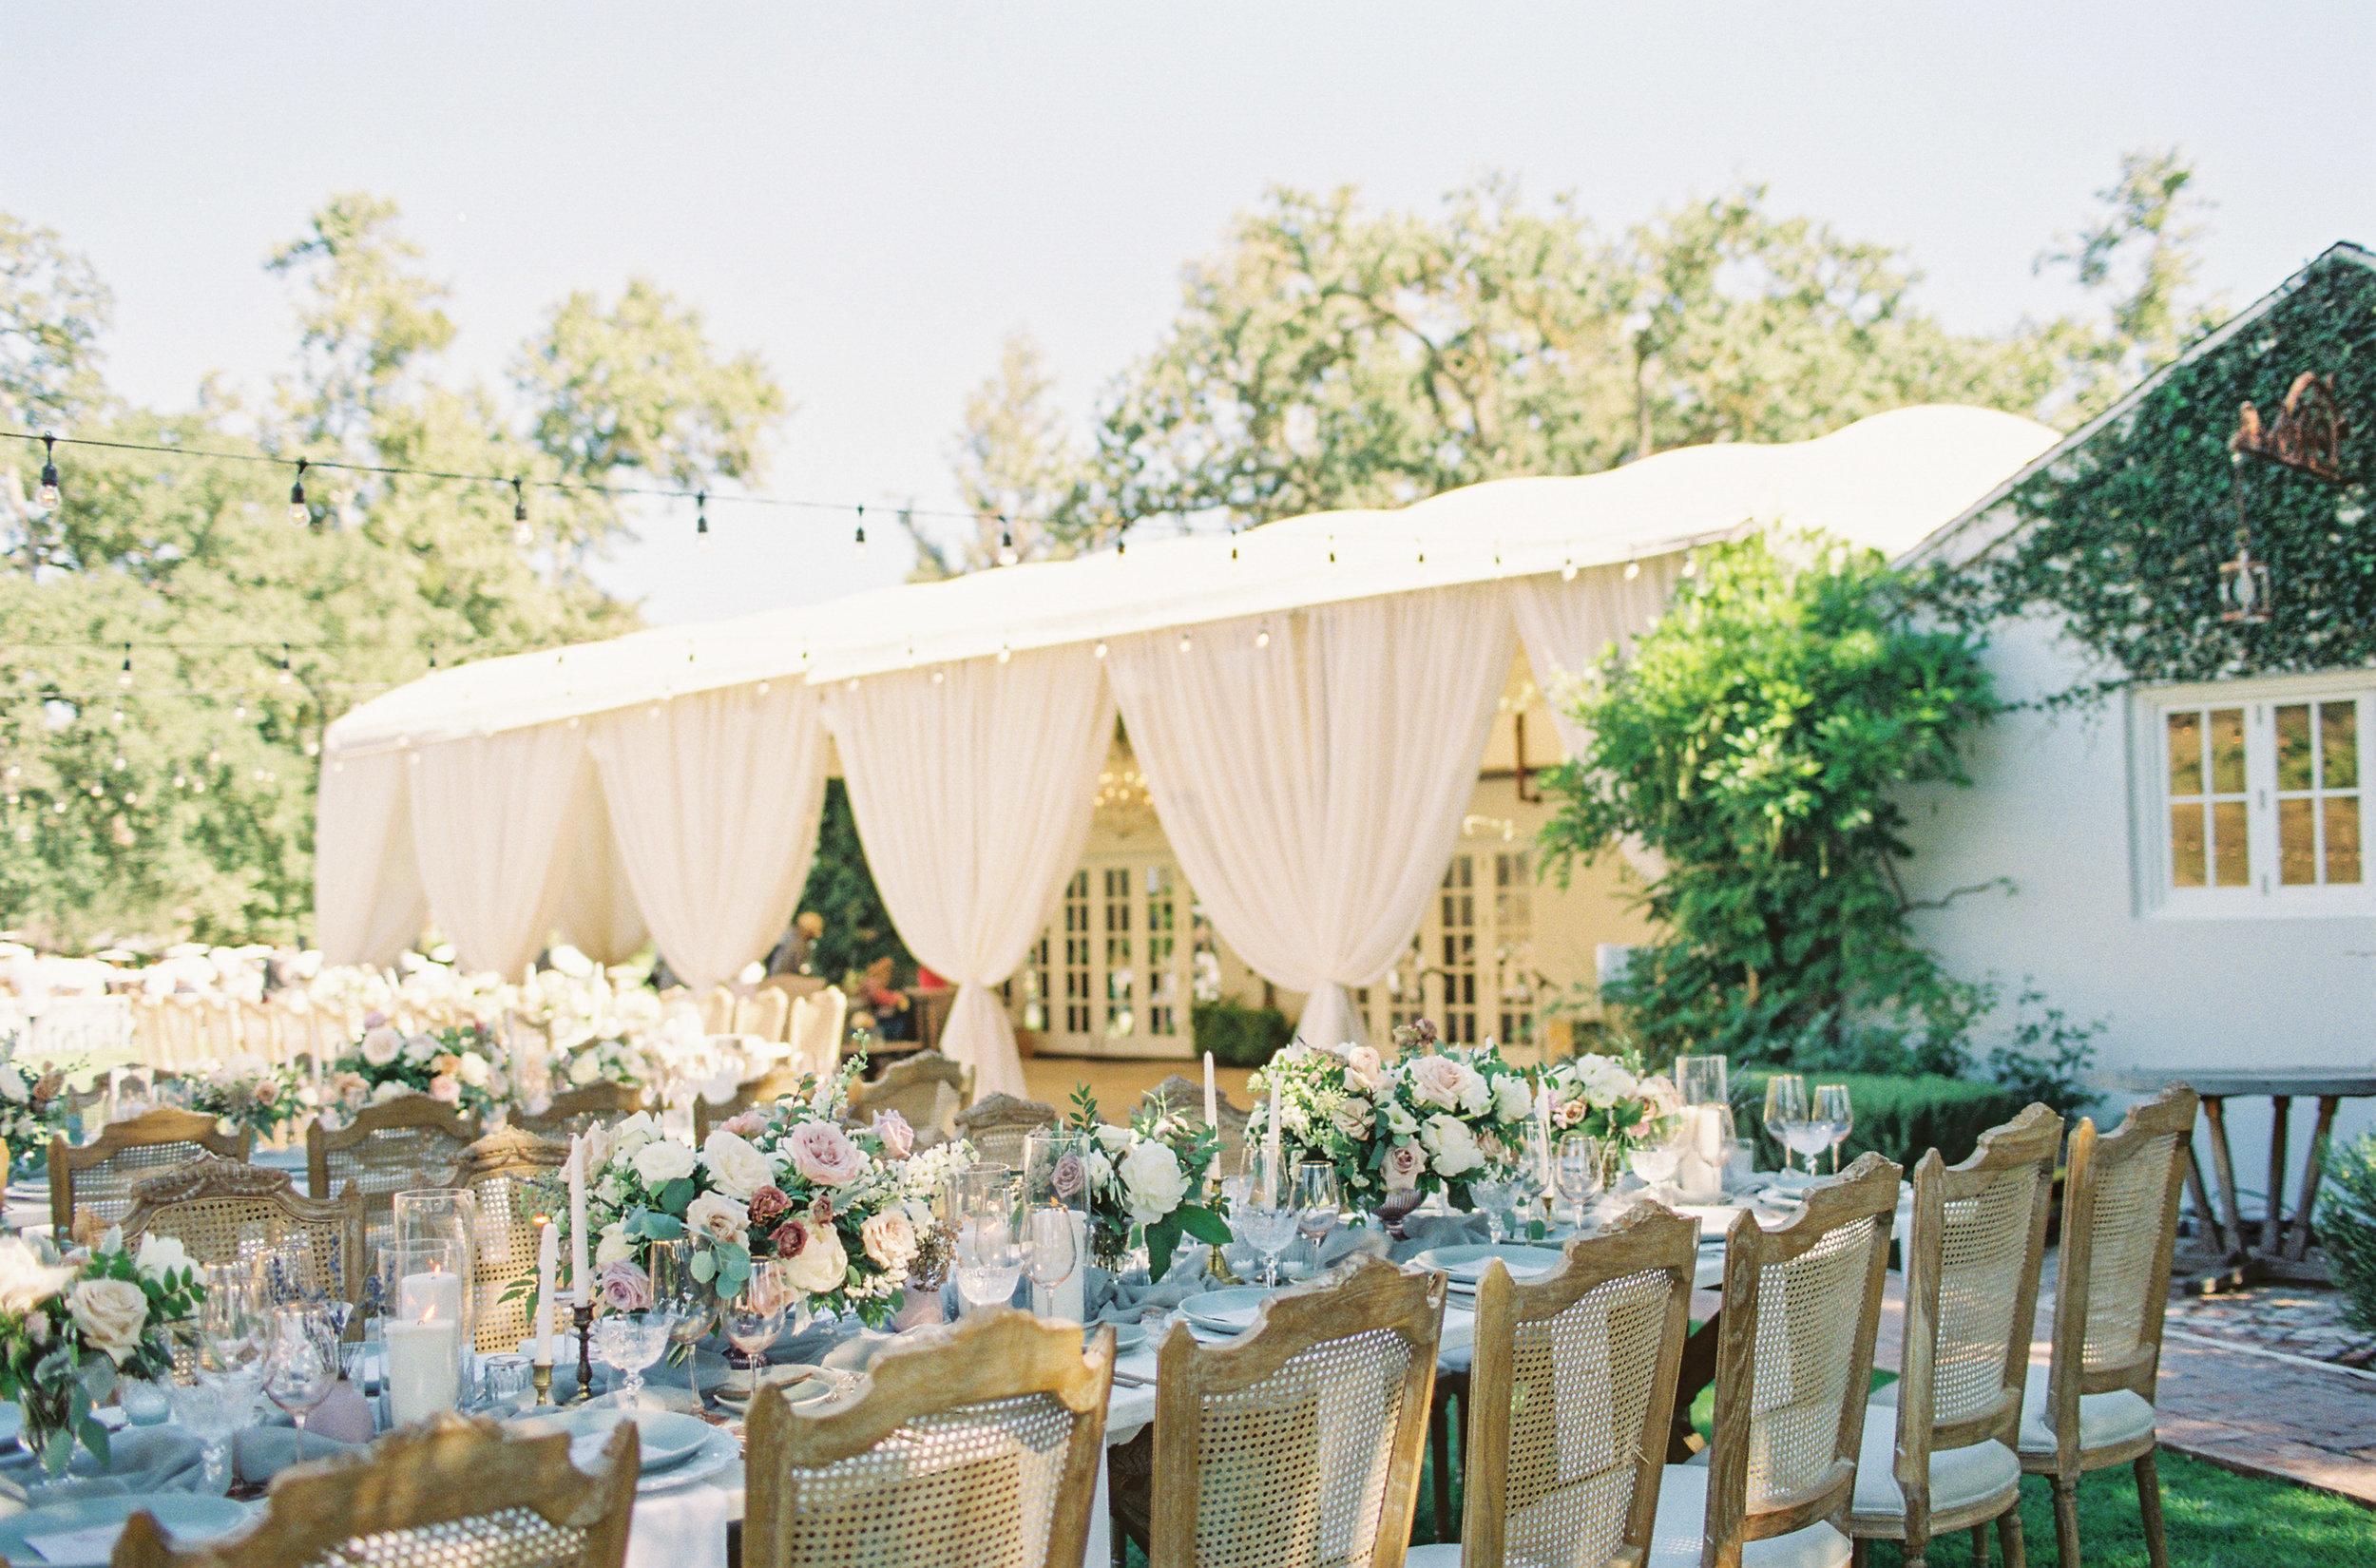 Triunfo_Creek_Winery_Wedding-201-Jen-Huang-JL-52-Jen-Huang-009955-R1-018.jpg